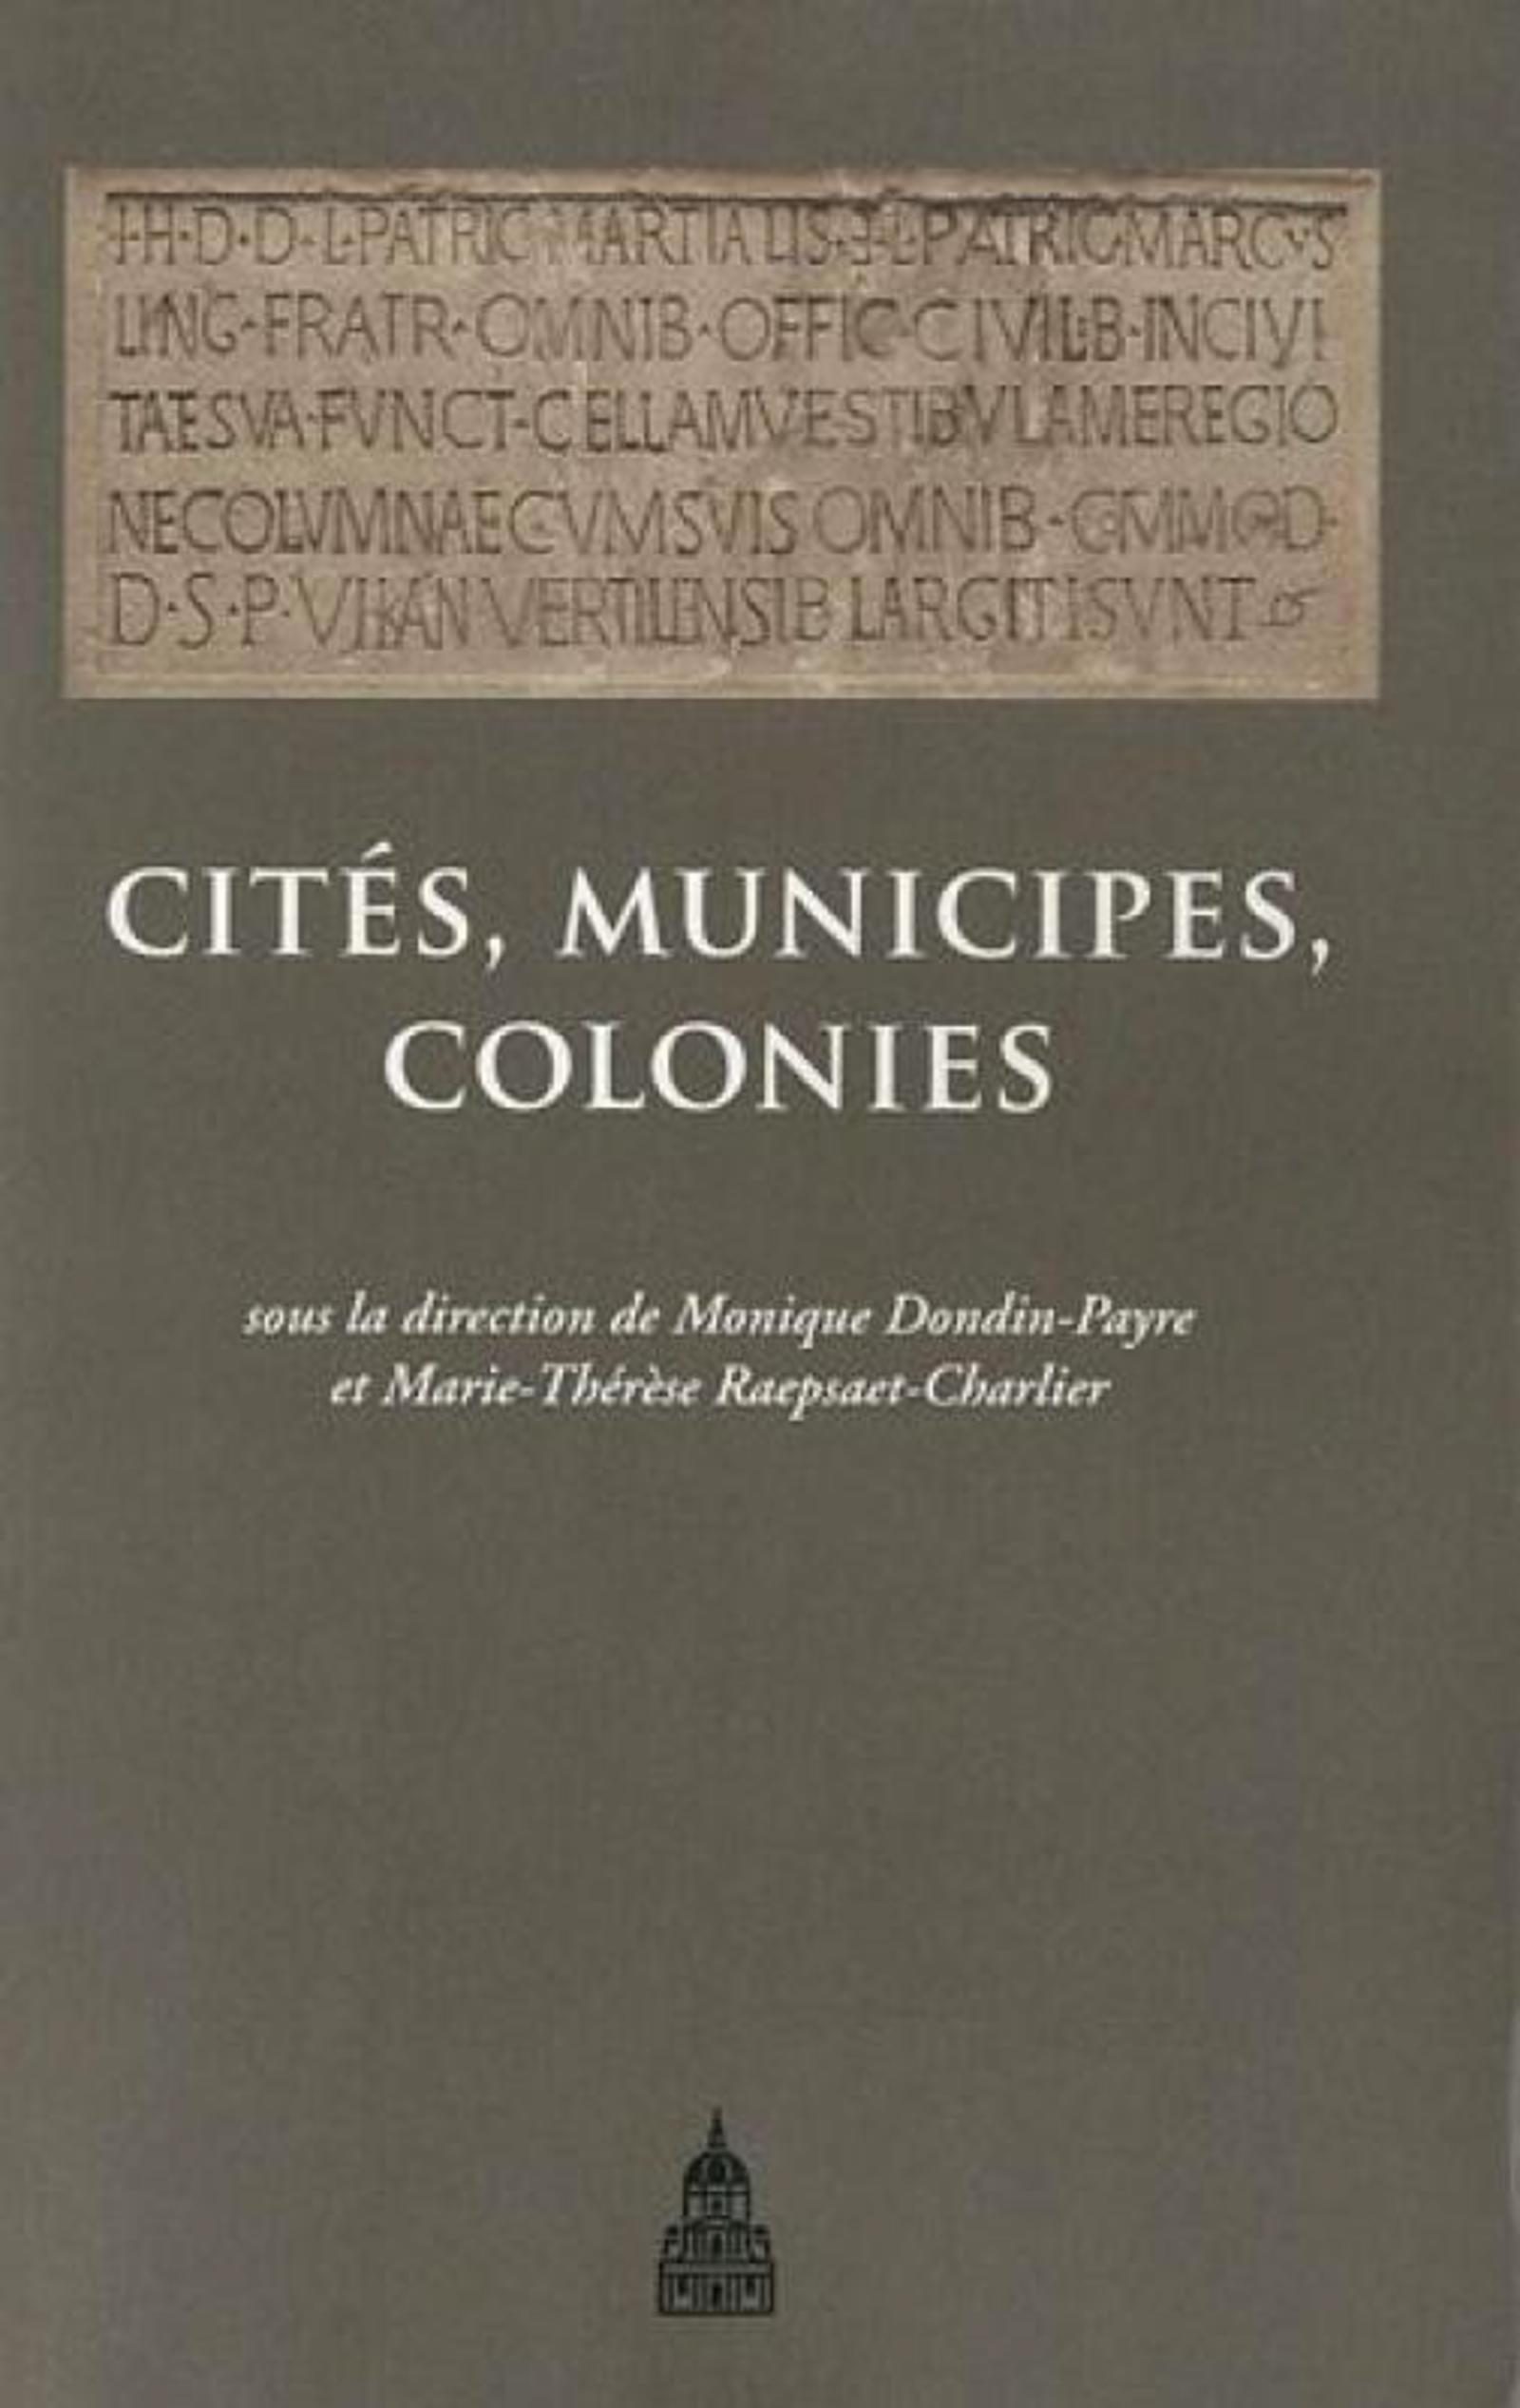 CITES MUNICIPES COLONIES